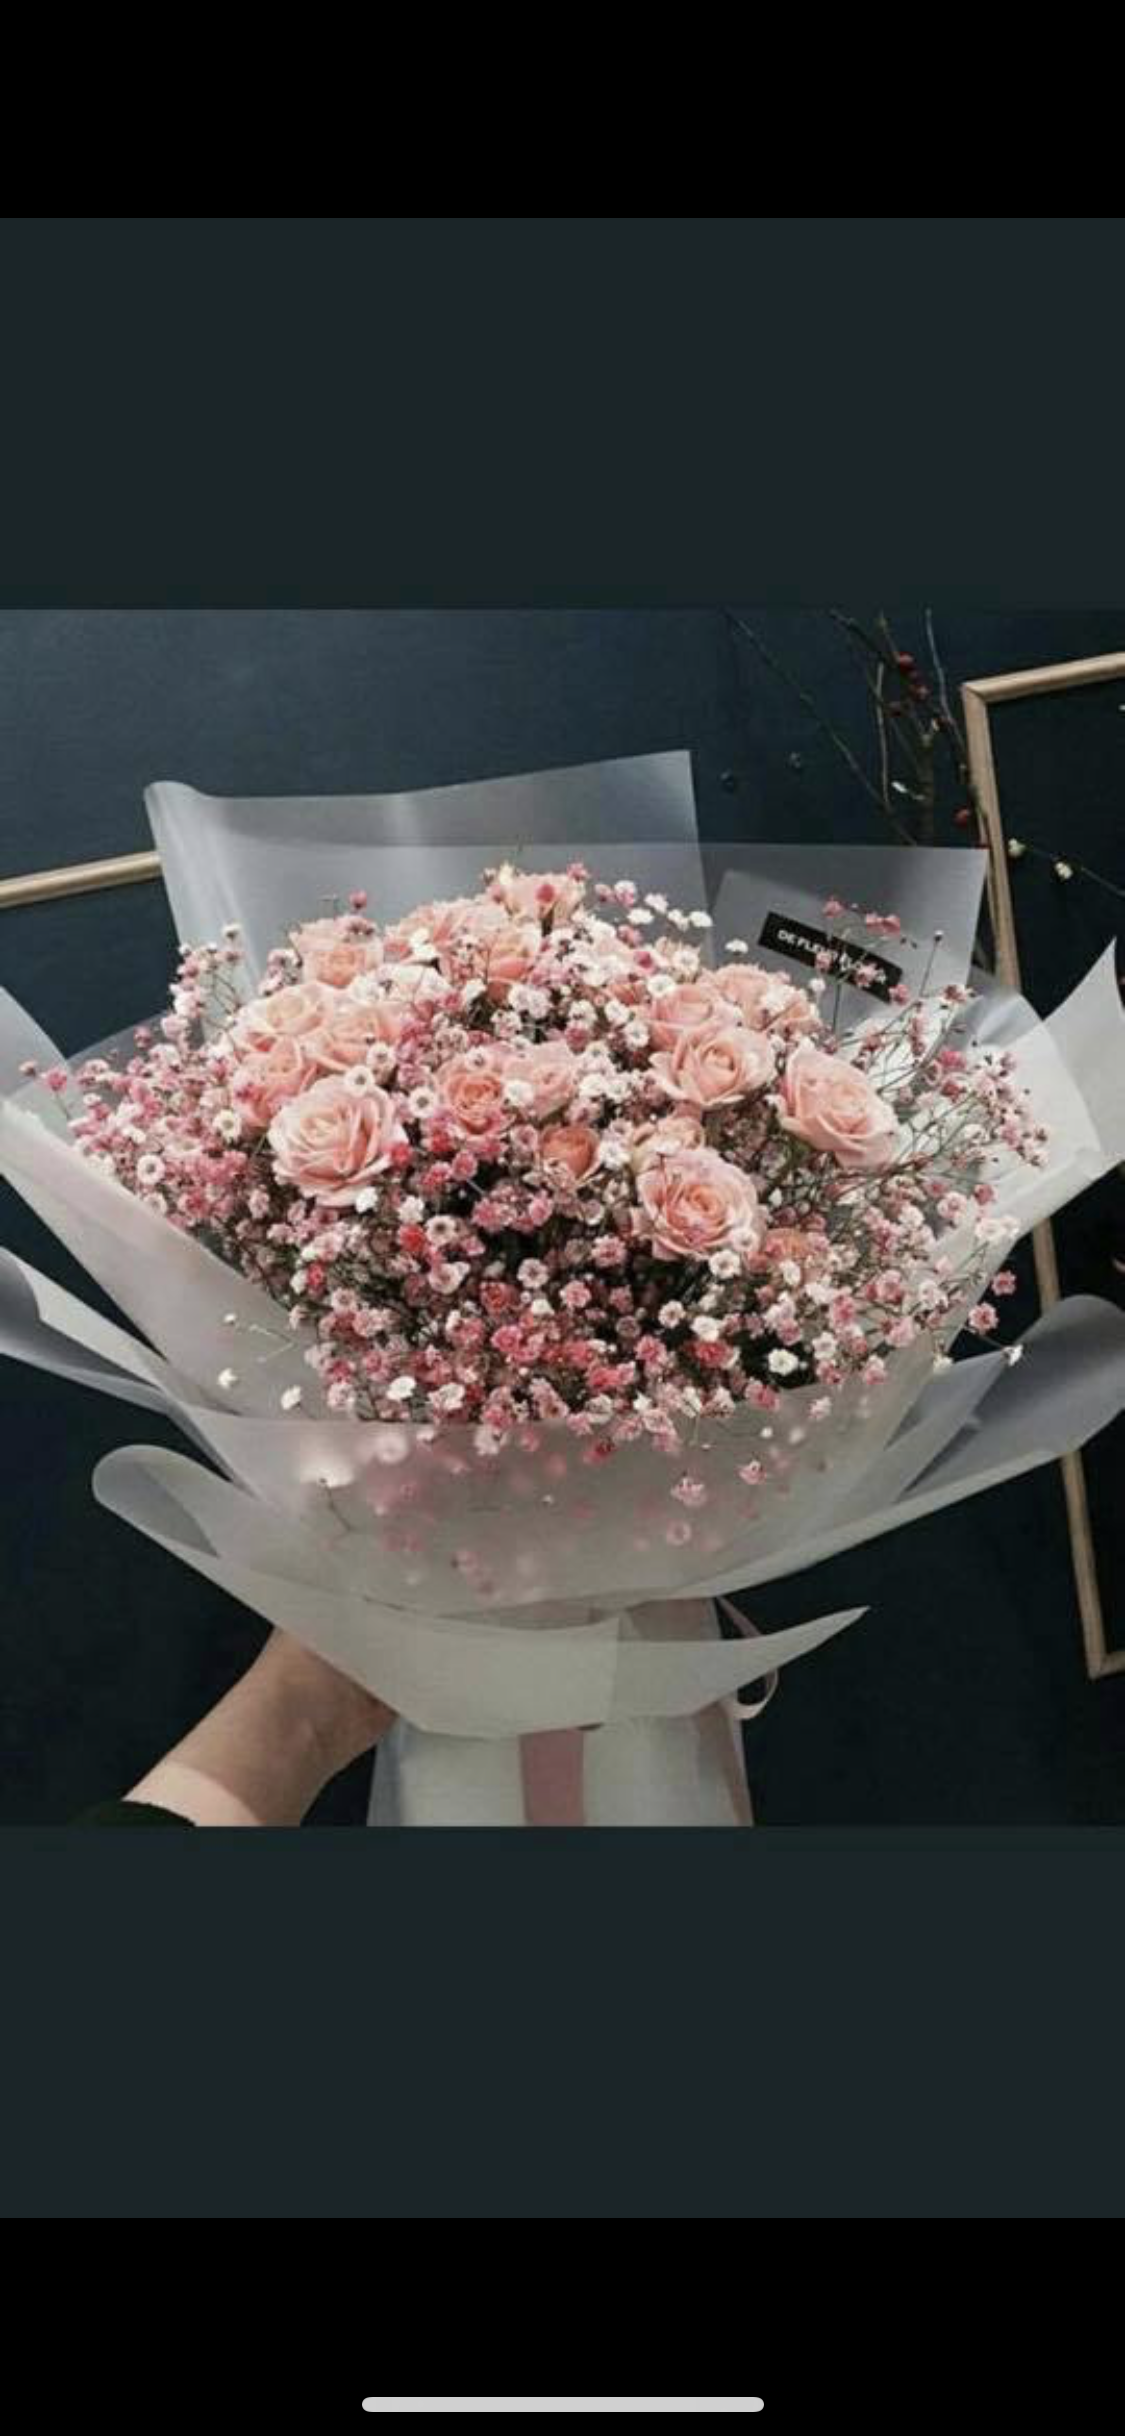 Pin By Sarah Ramirez Blanc On Wedding Pink Rose Bouquet Wax Flowers Pale Pink Roses